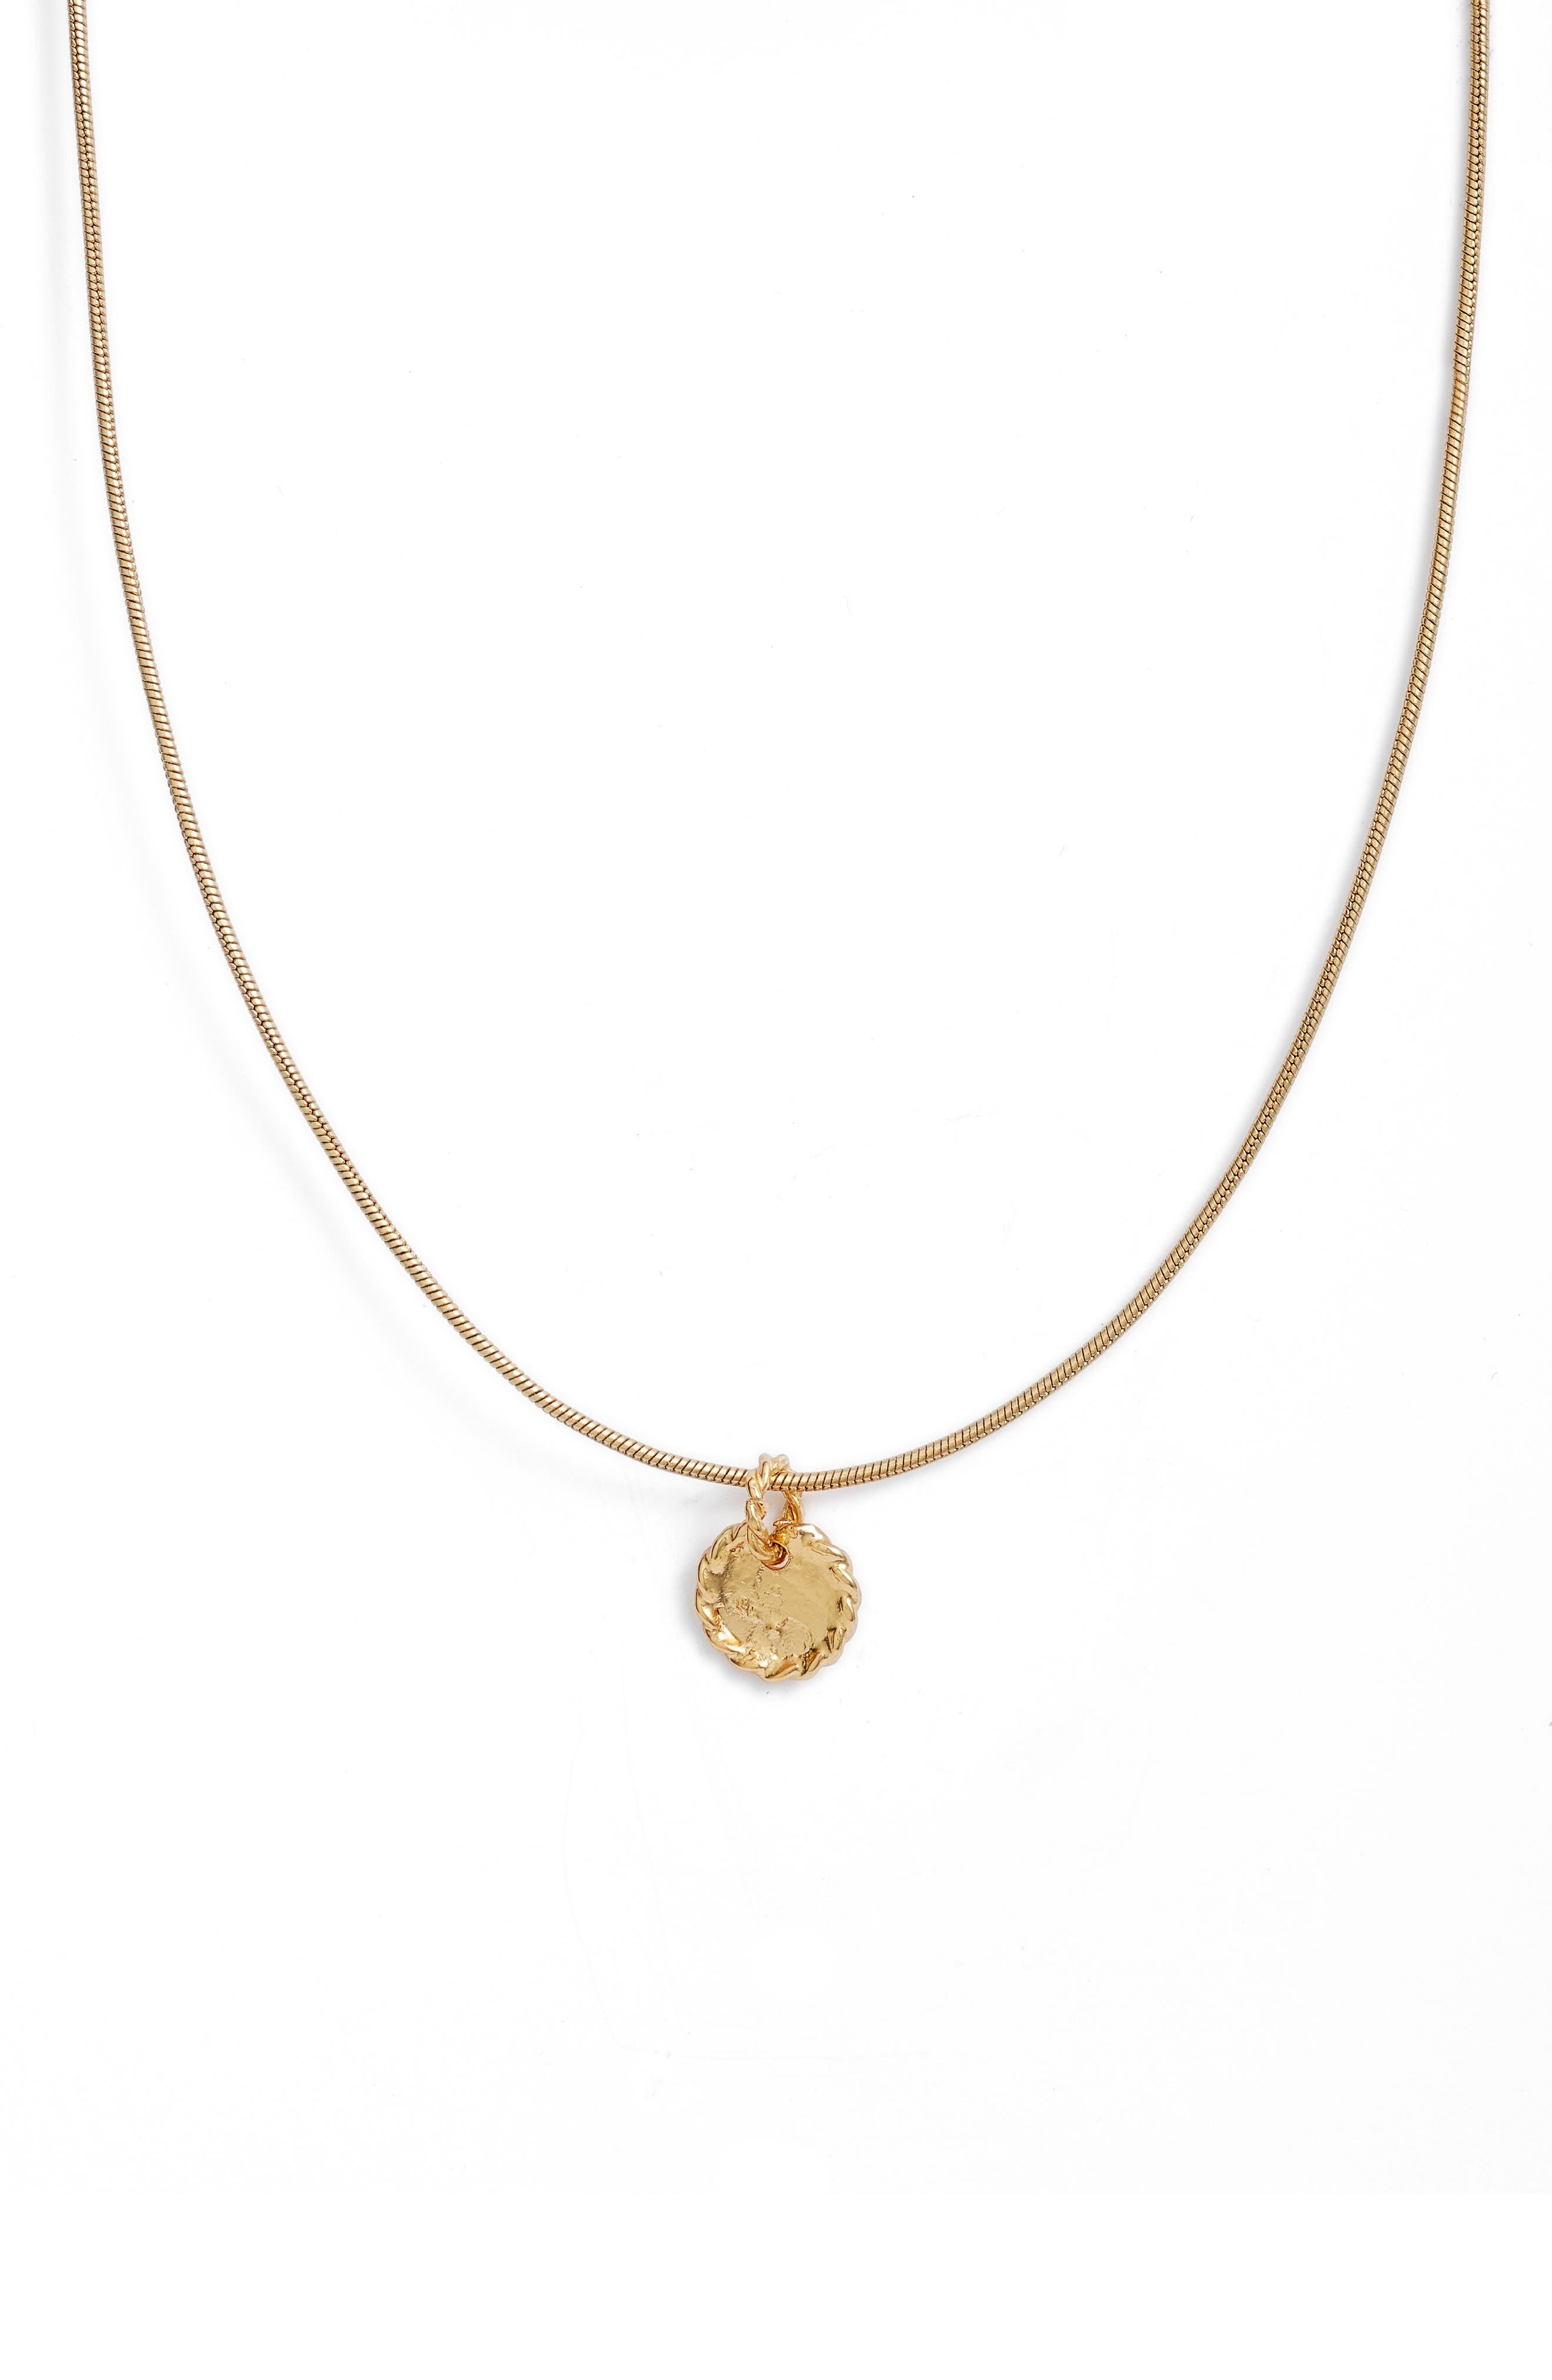 Crisobela Jewelry La Maga Morena Coin Pendant Necklace in Gold at Nordstrom